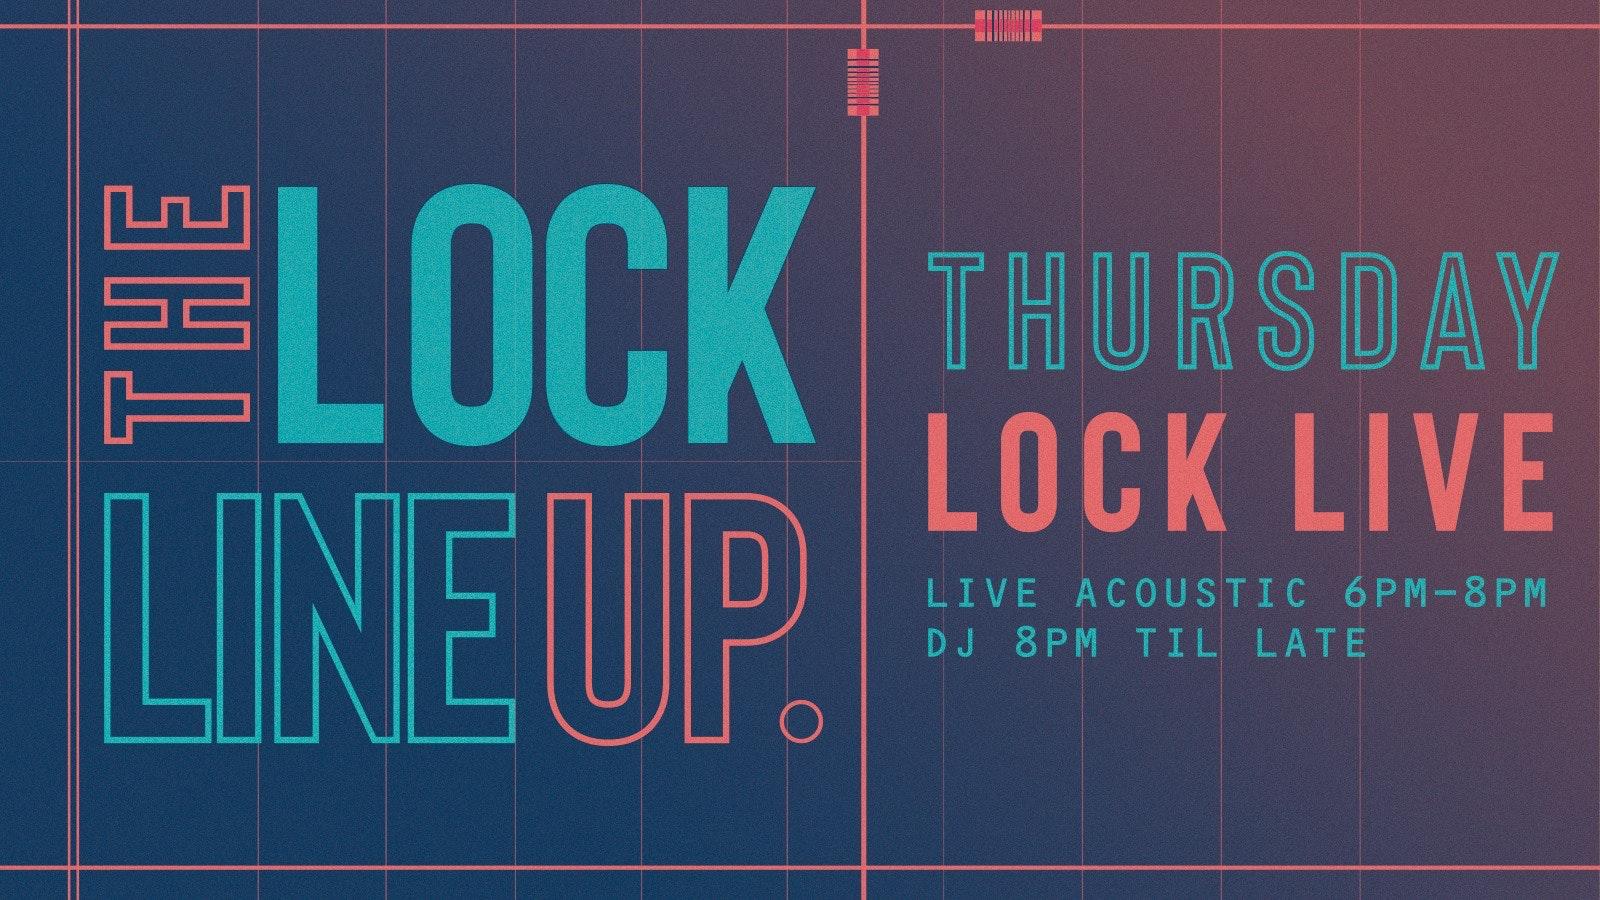 Lock Live – Every Thursday